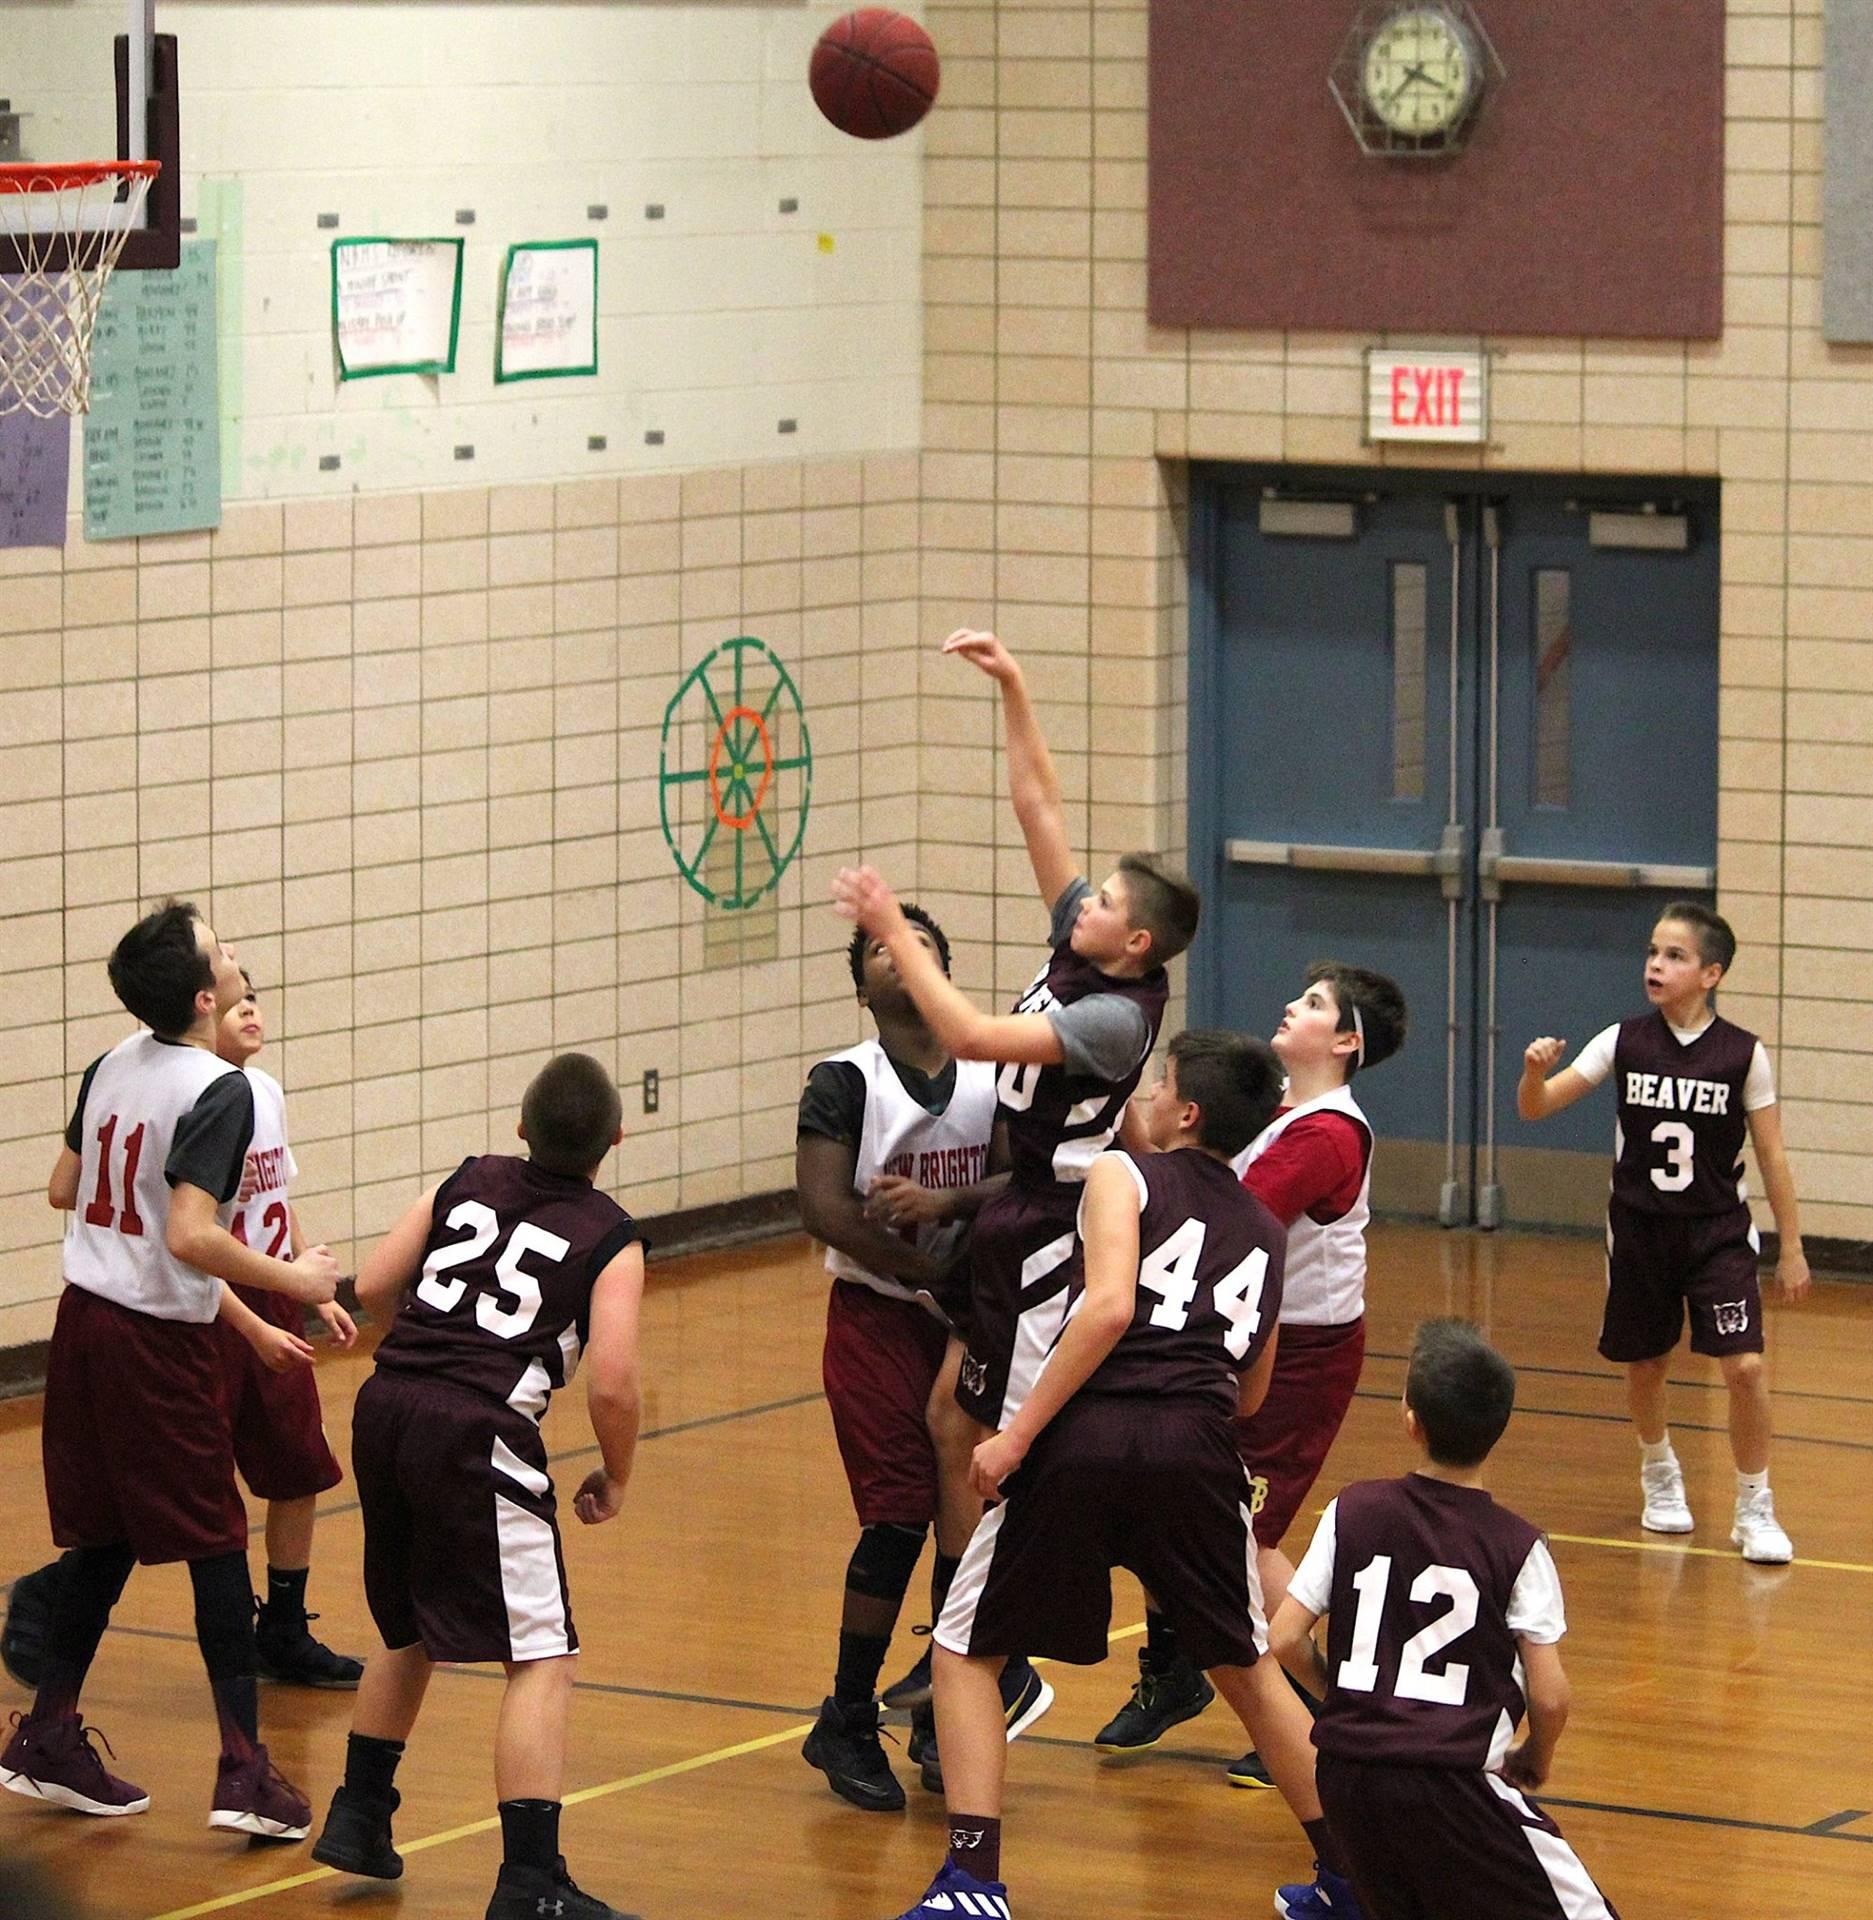 7th grade BKB - Nice shot!